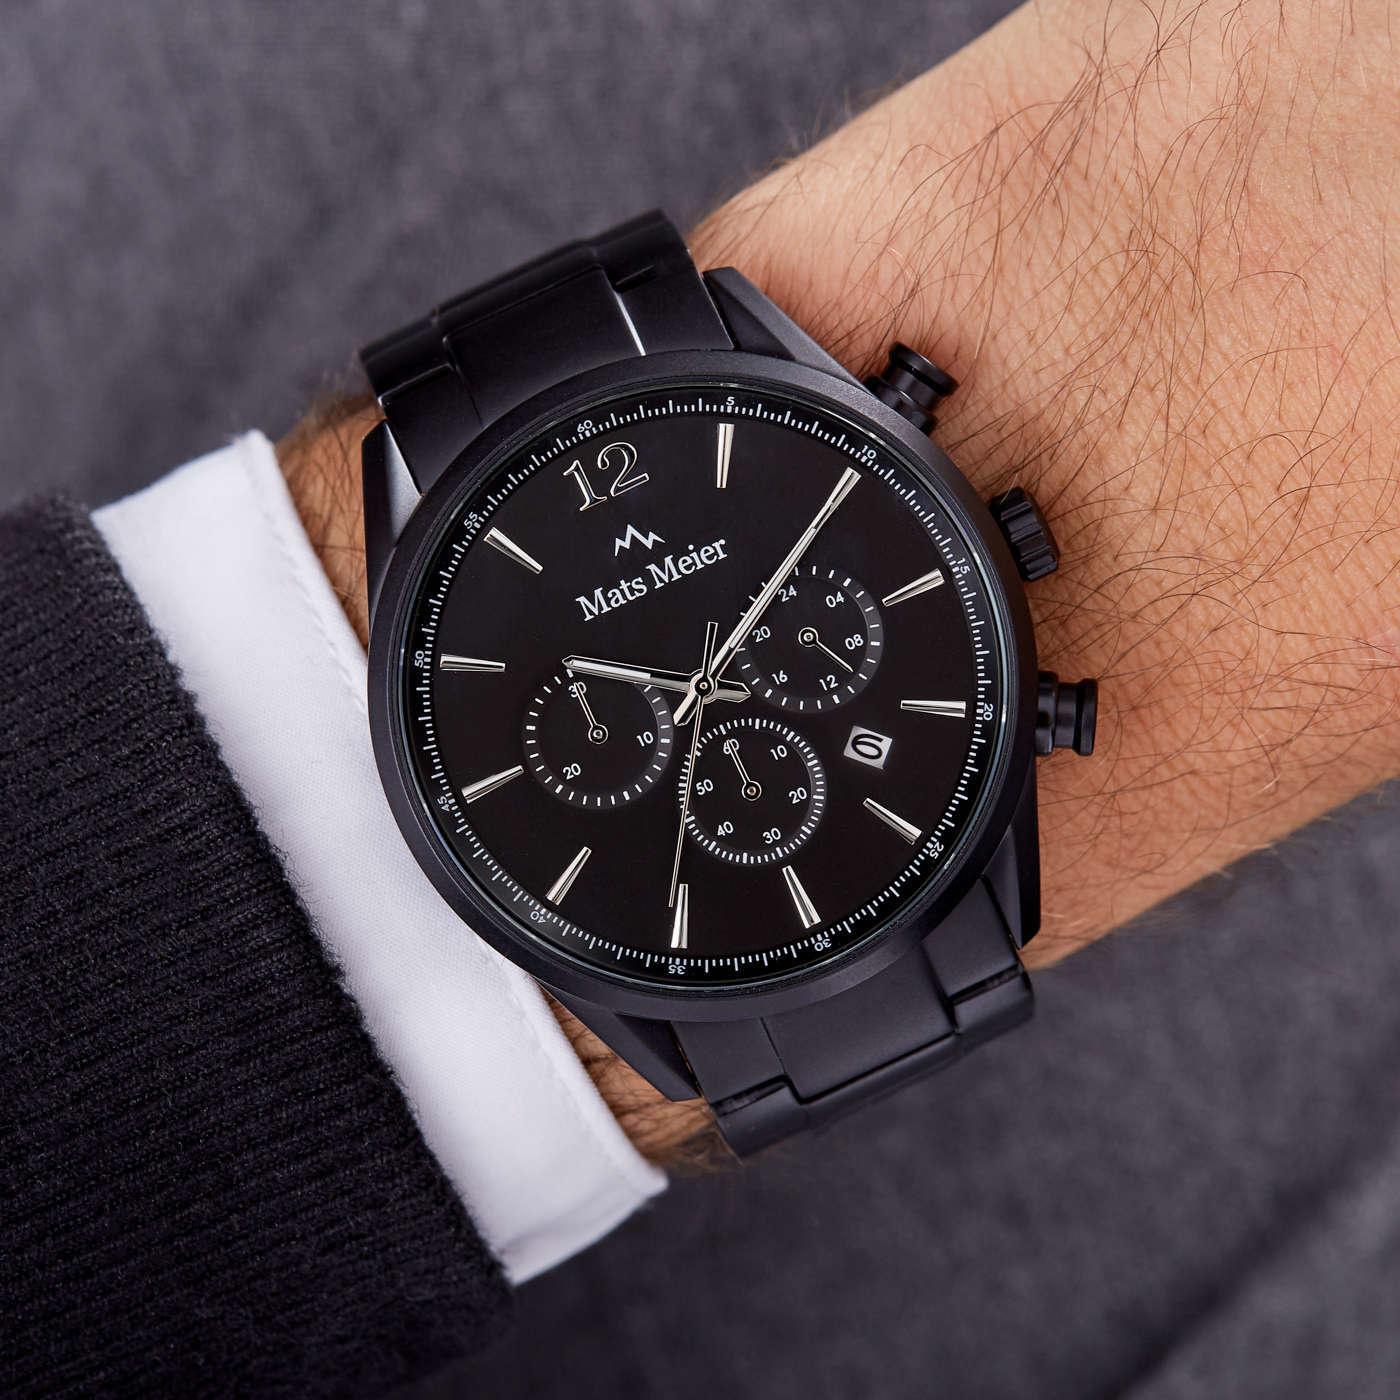 Mats Meier Cronografo Grand Cornier acciaio nero opaco